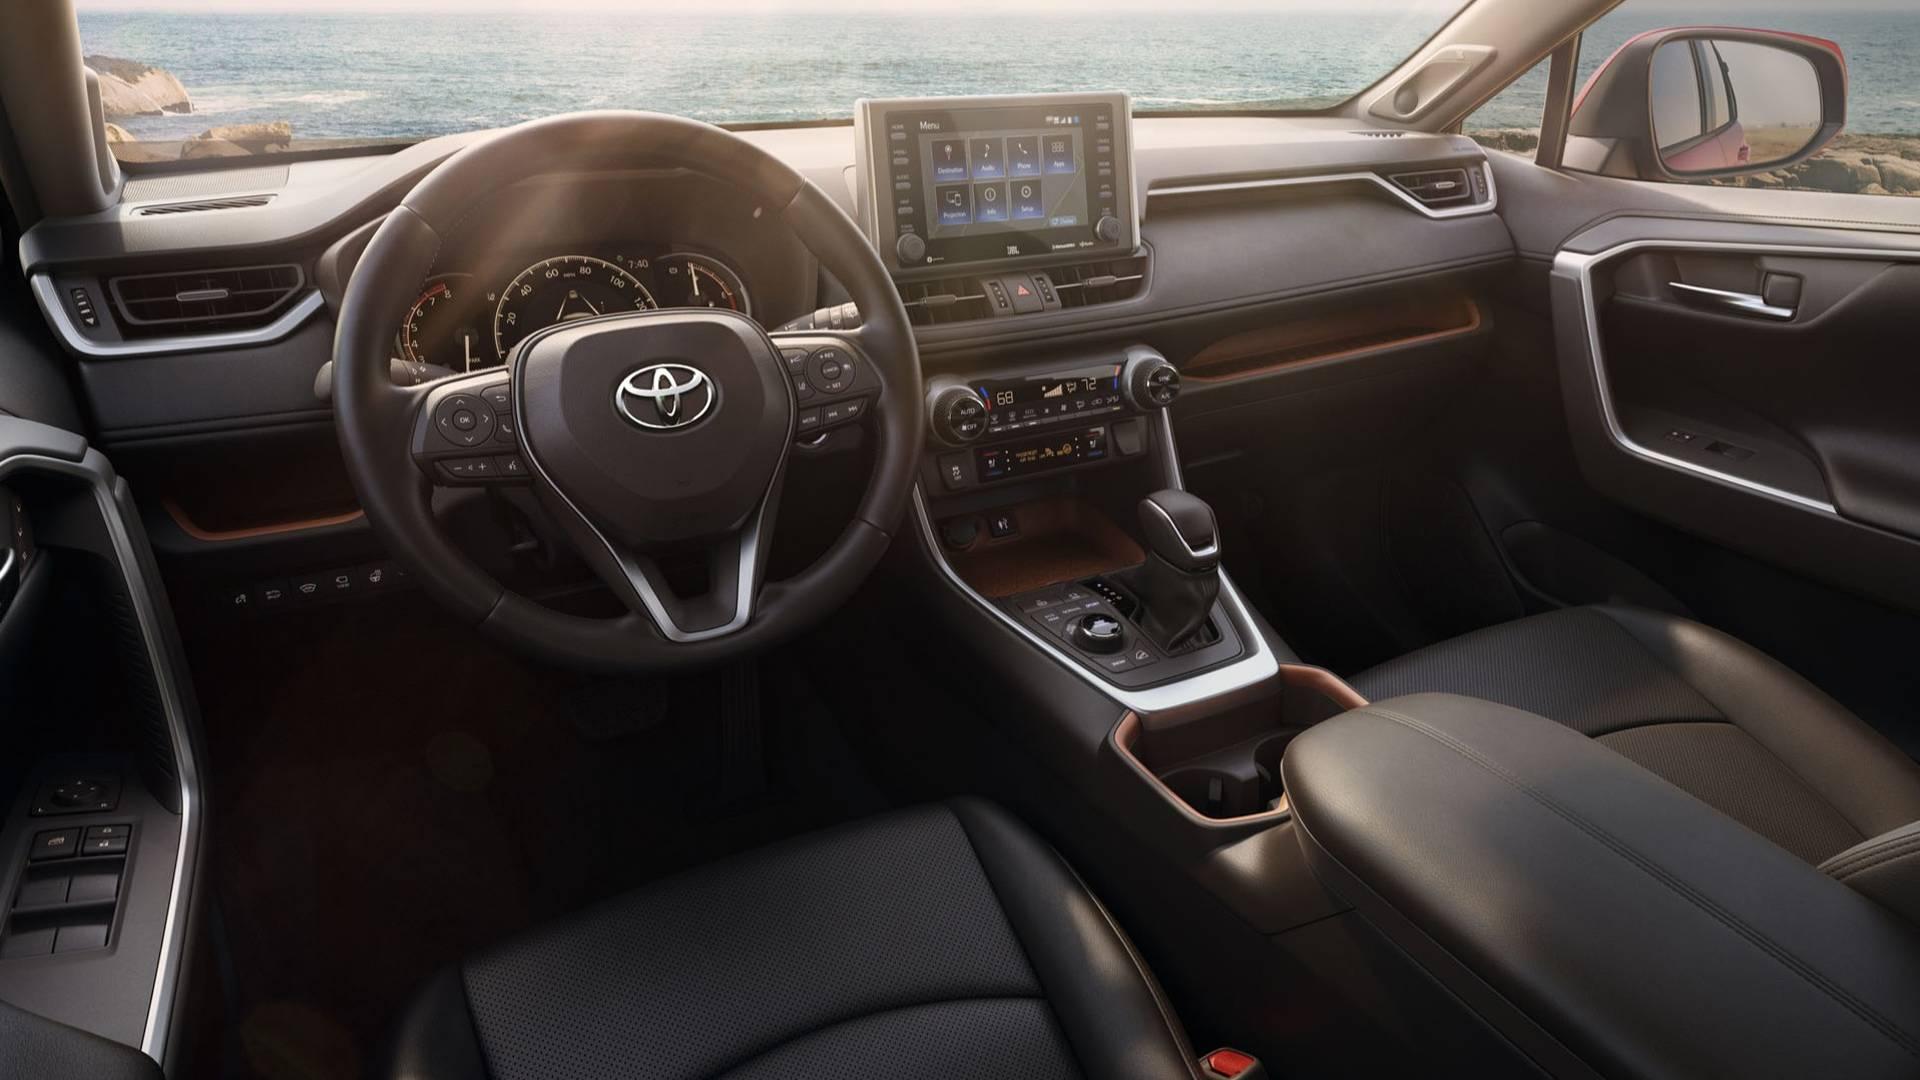 Vwvortexcom All New Fifth Gen 2019 Toyota Rav4 Unveiled In New